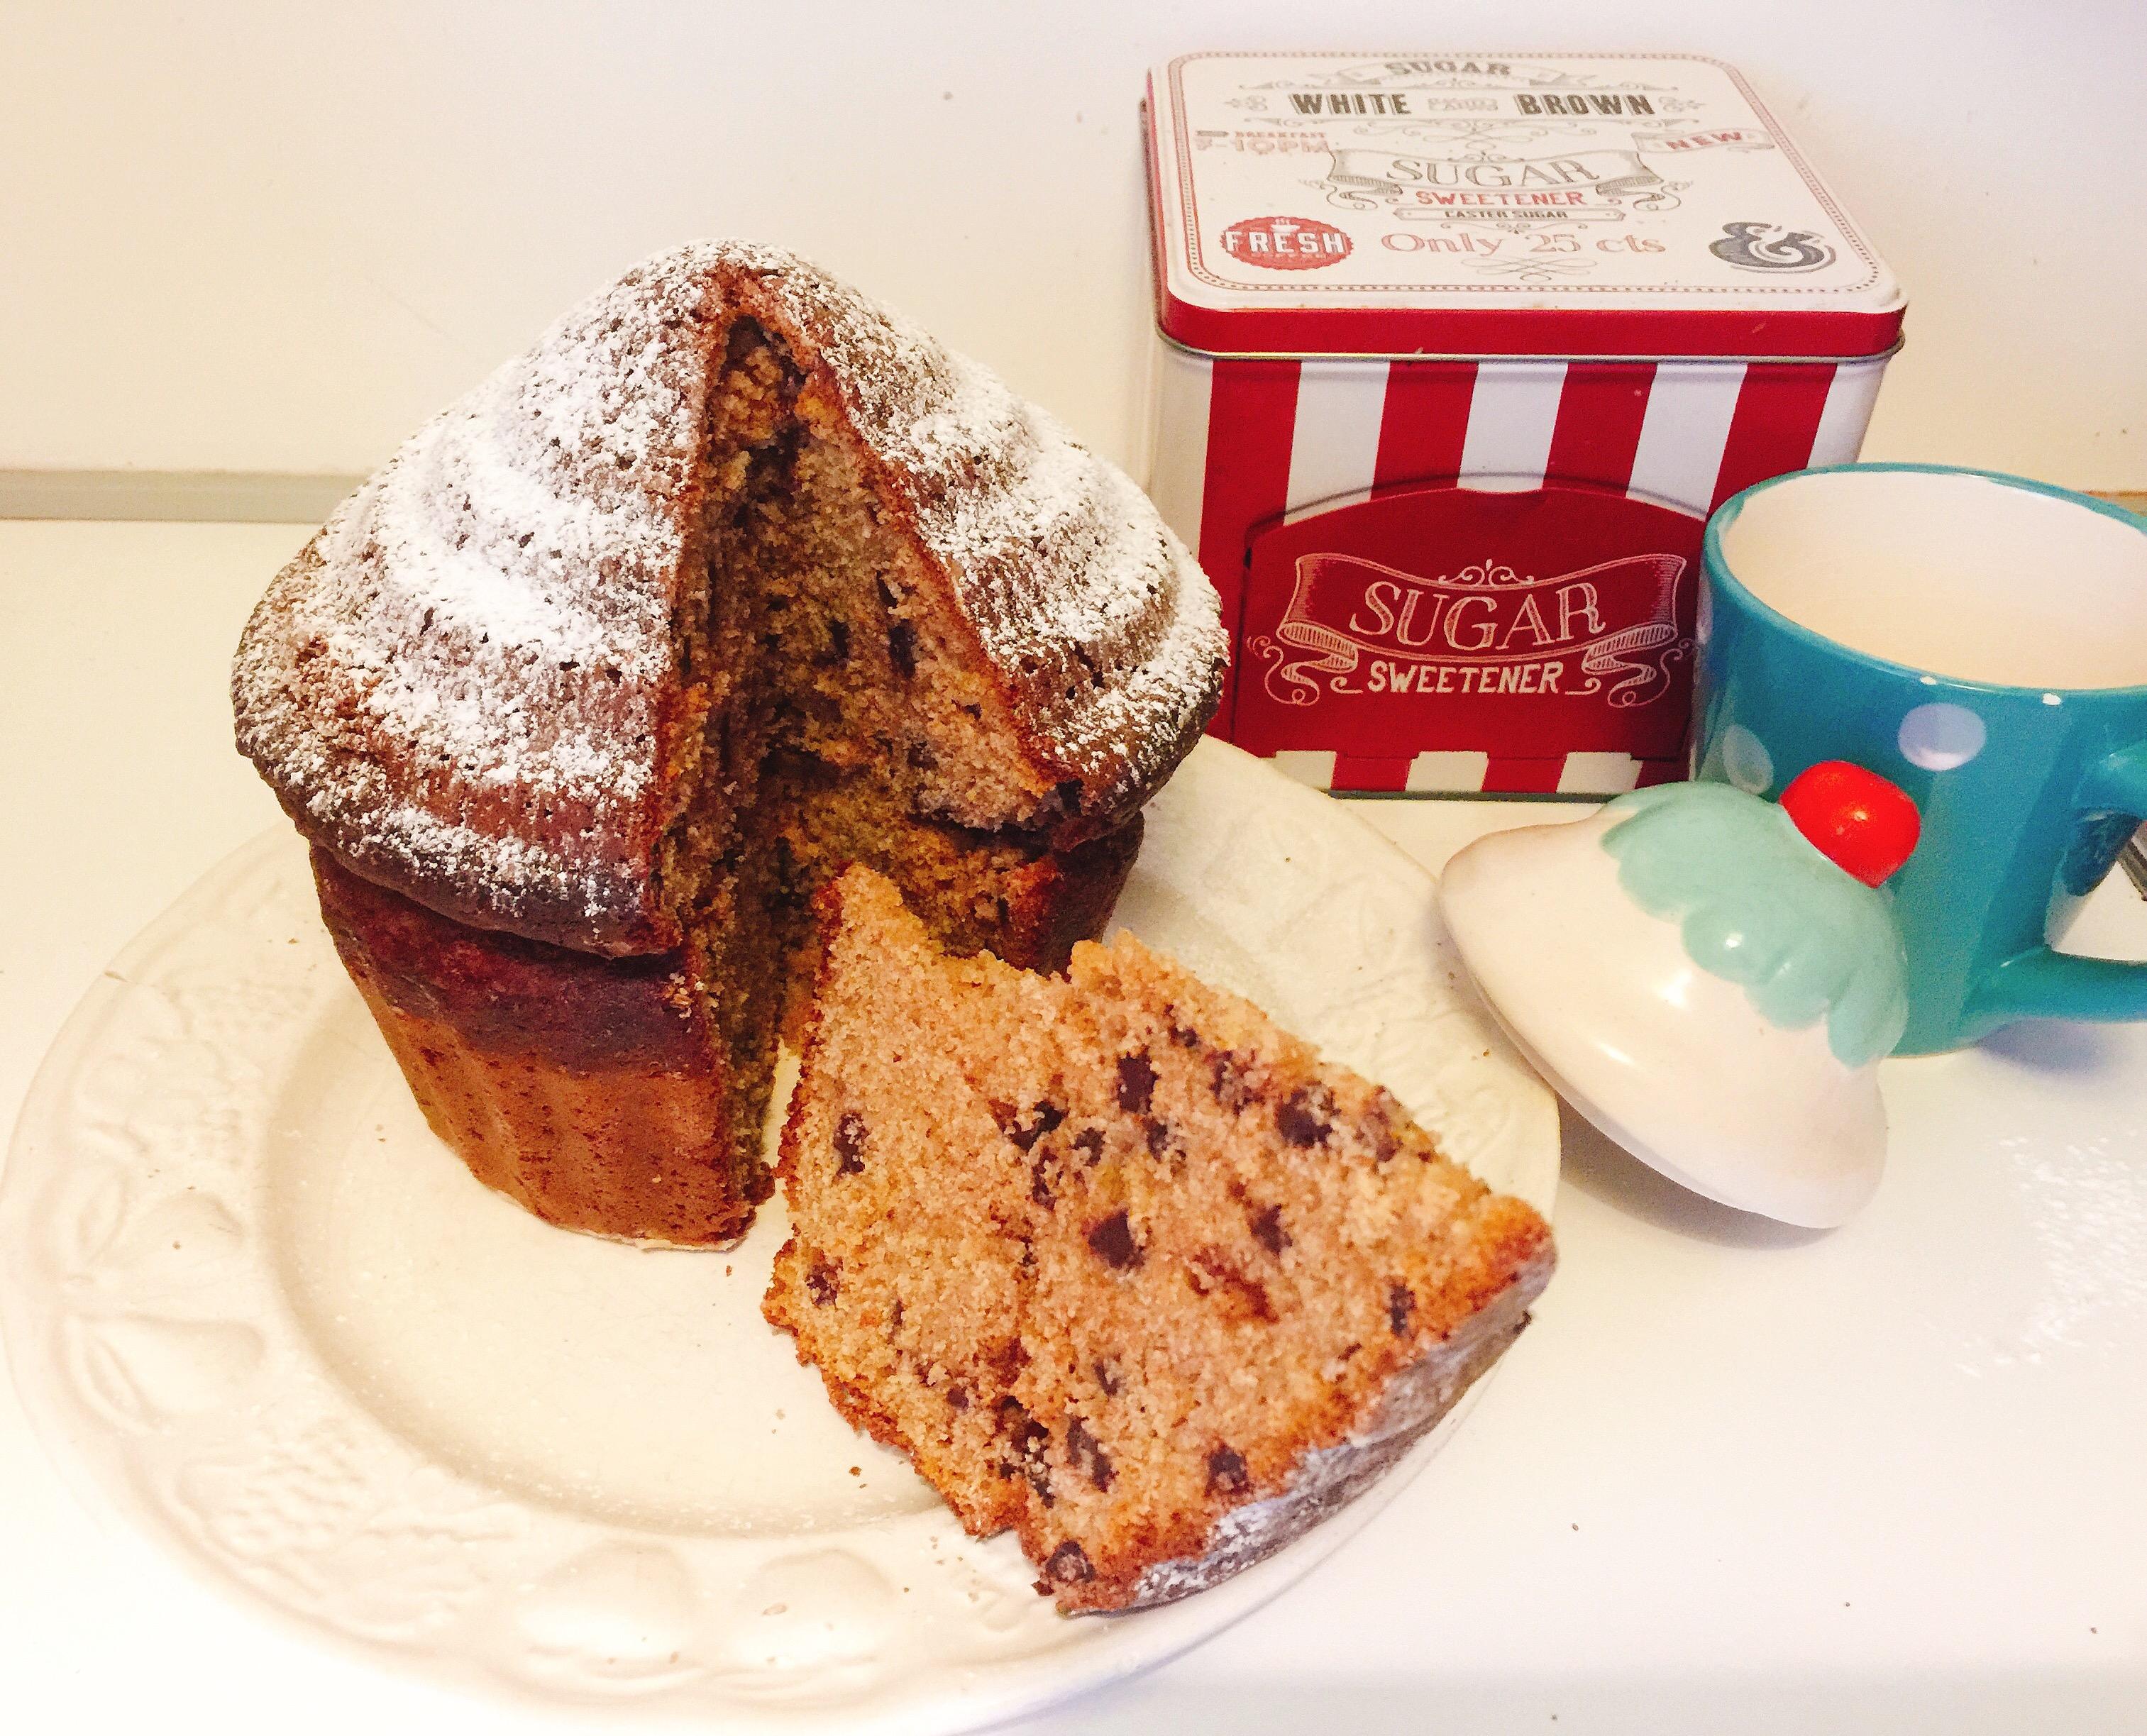 Muffin Gigante Senza Burro, una torta muffin super golosa di dolci senza burro